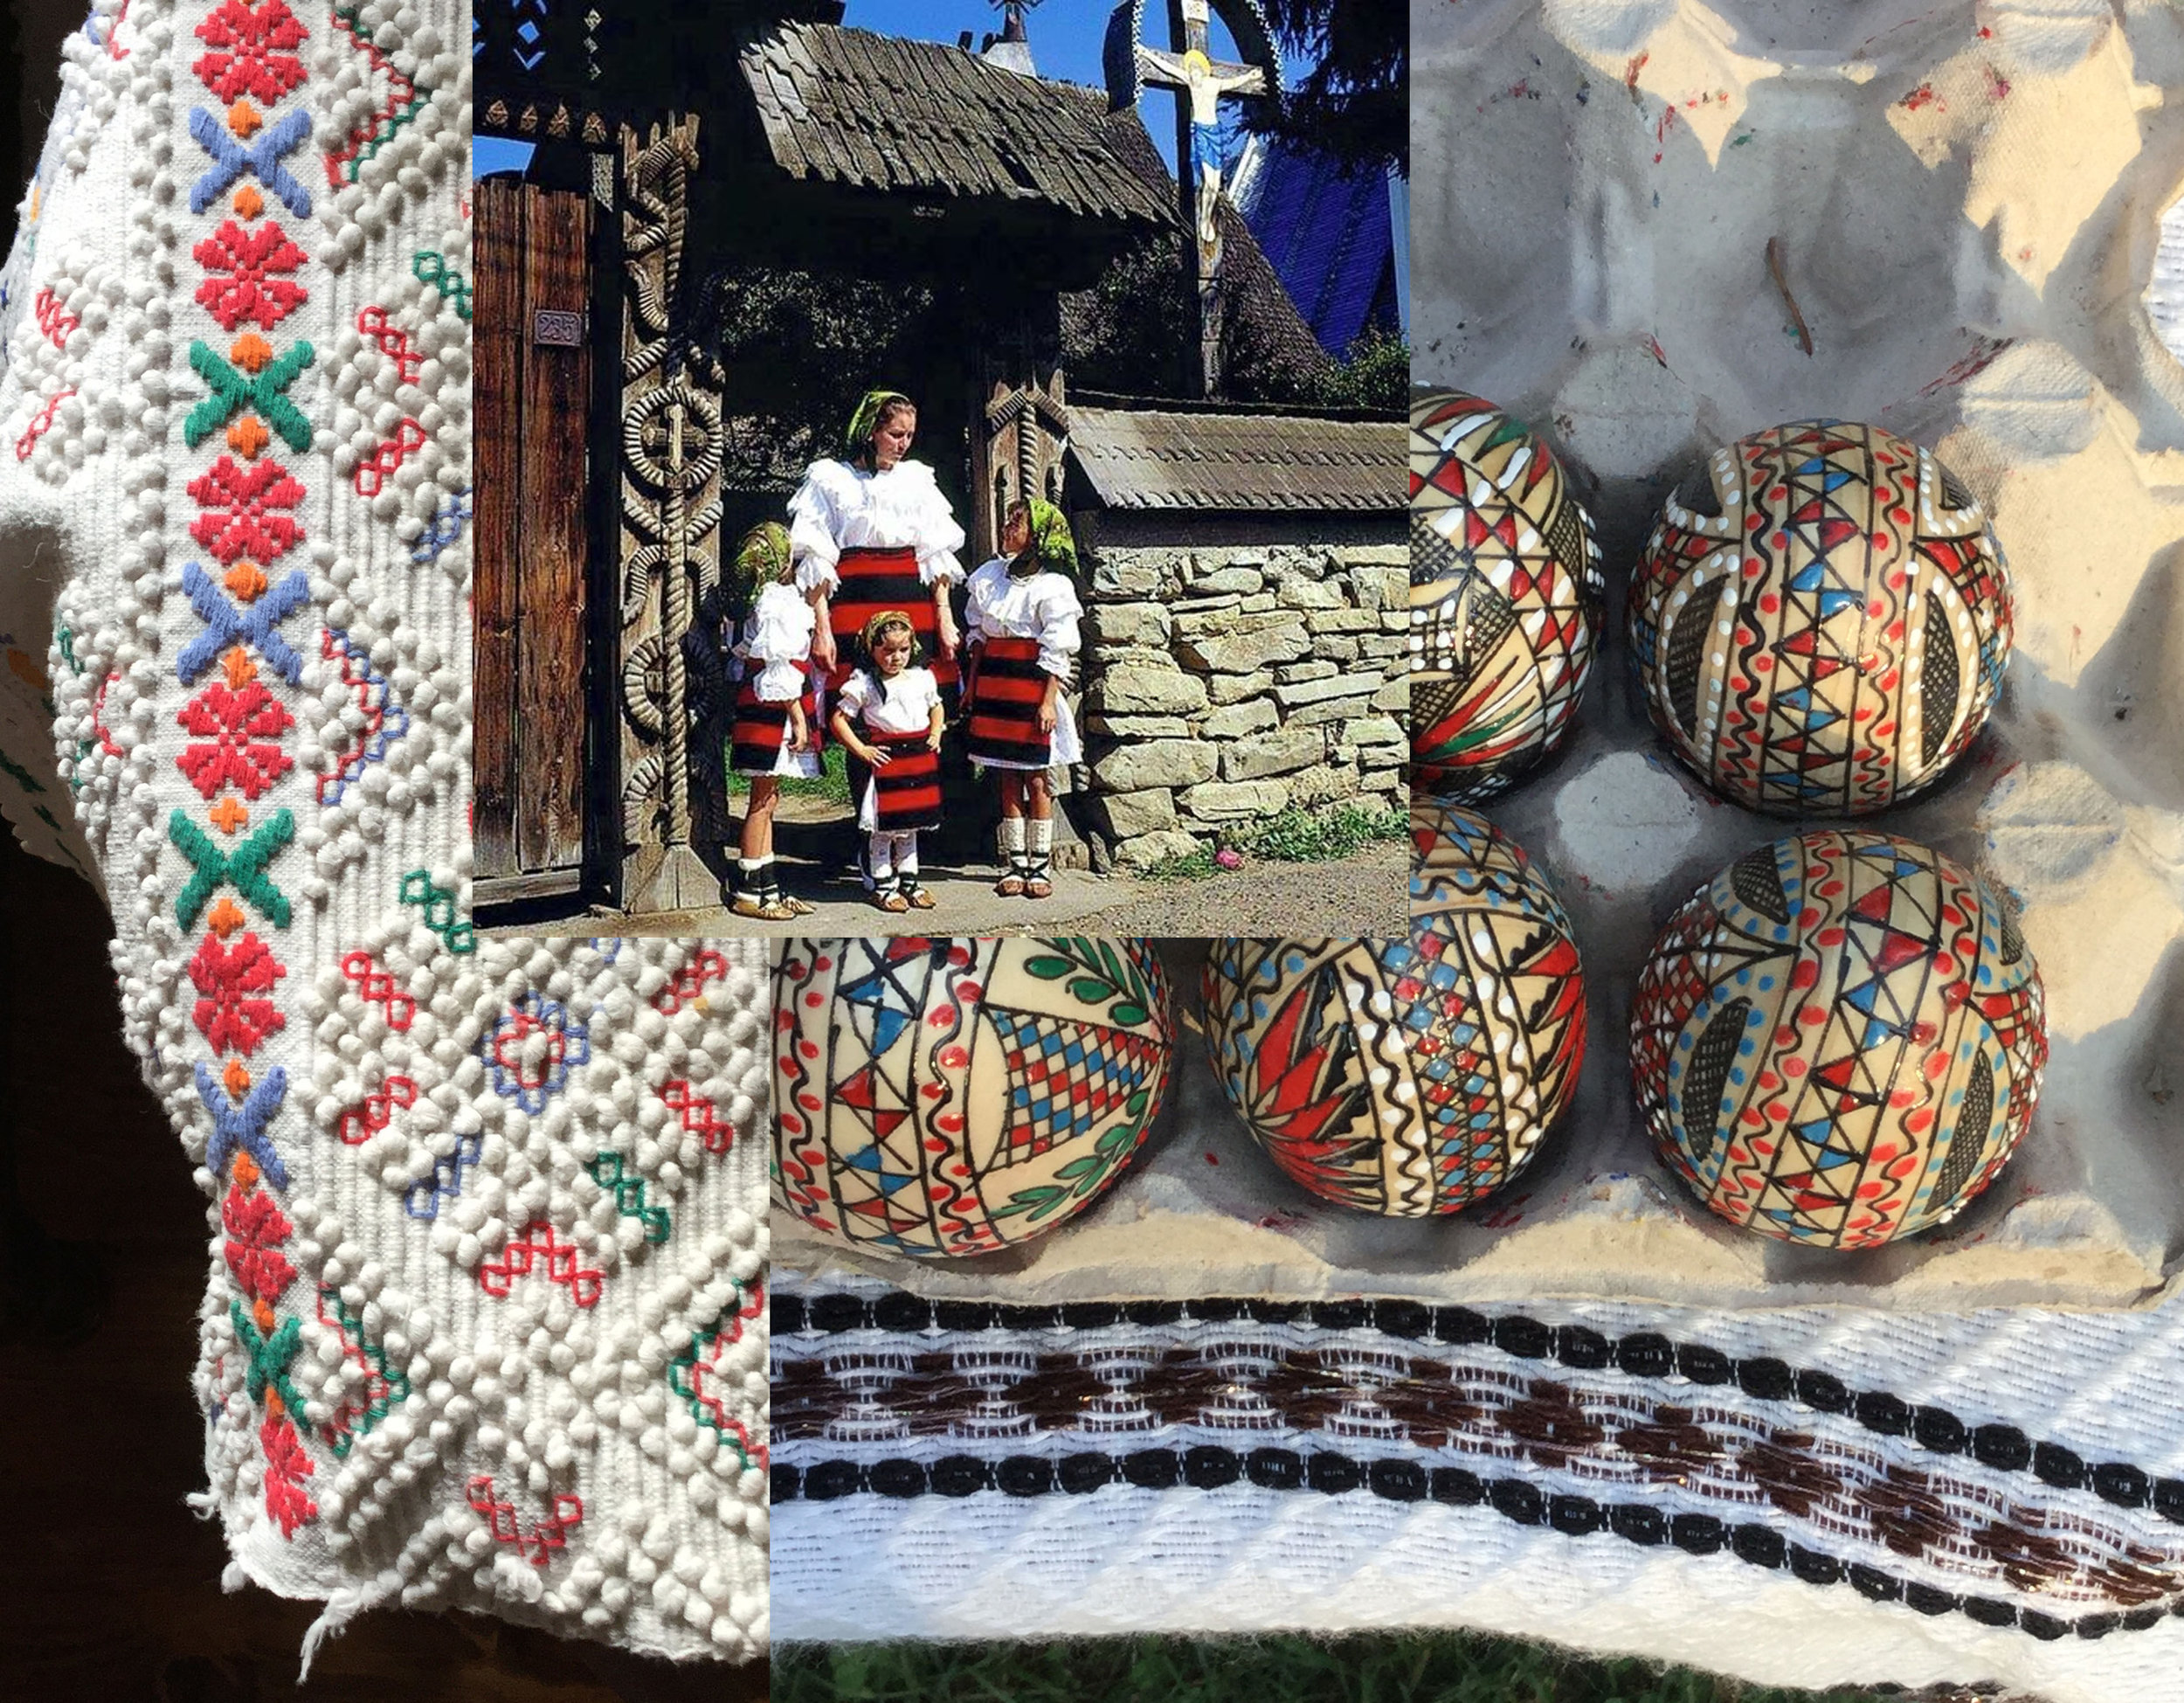 painted eggs - image sculpted entrance door in Maramures via  Facebook